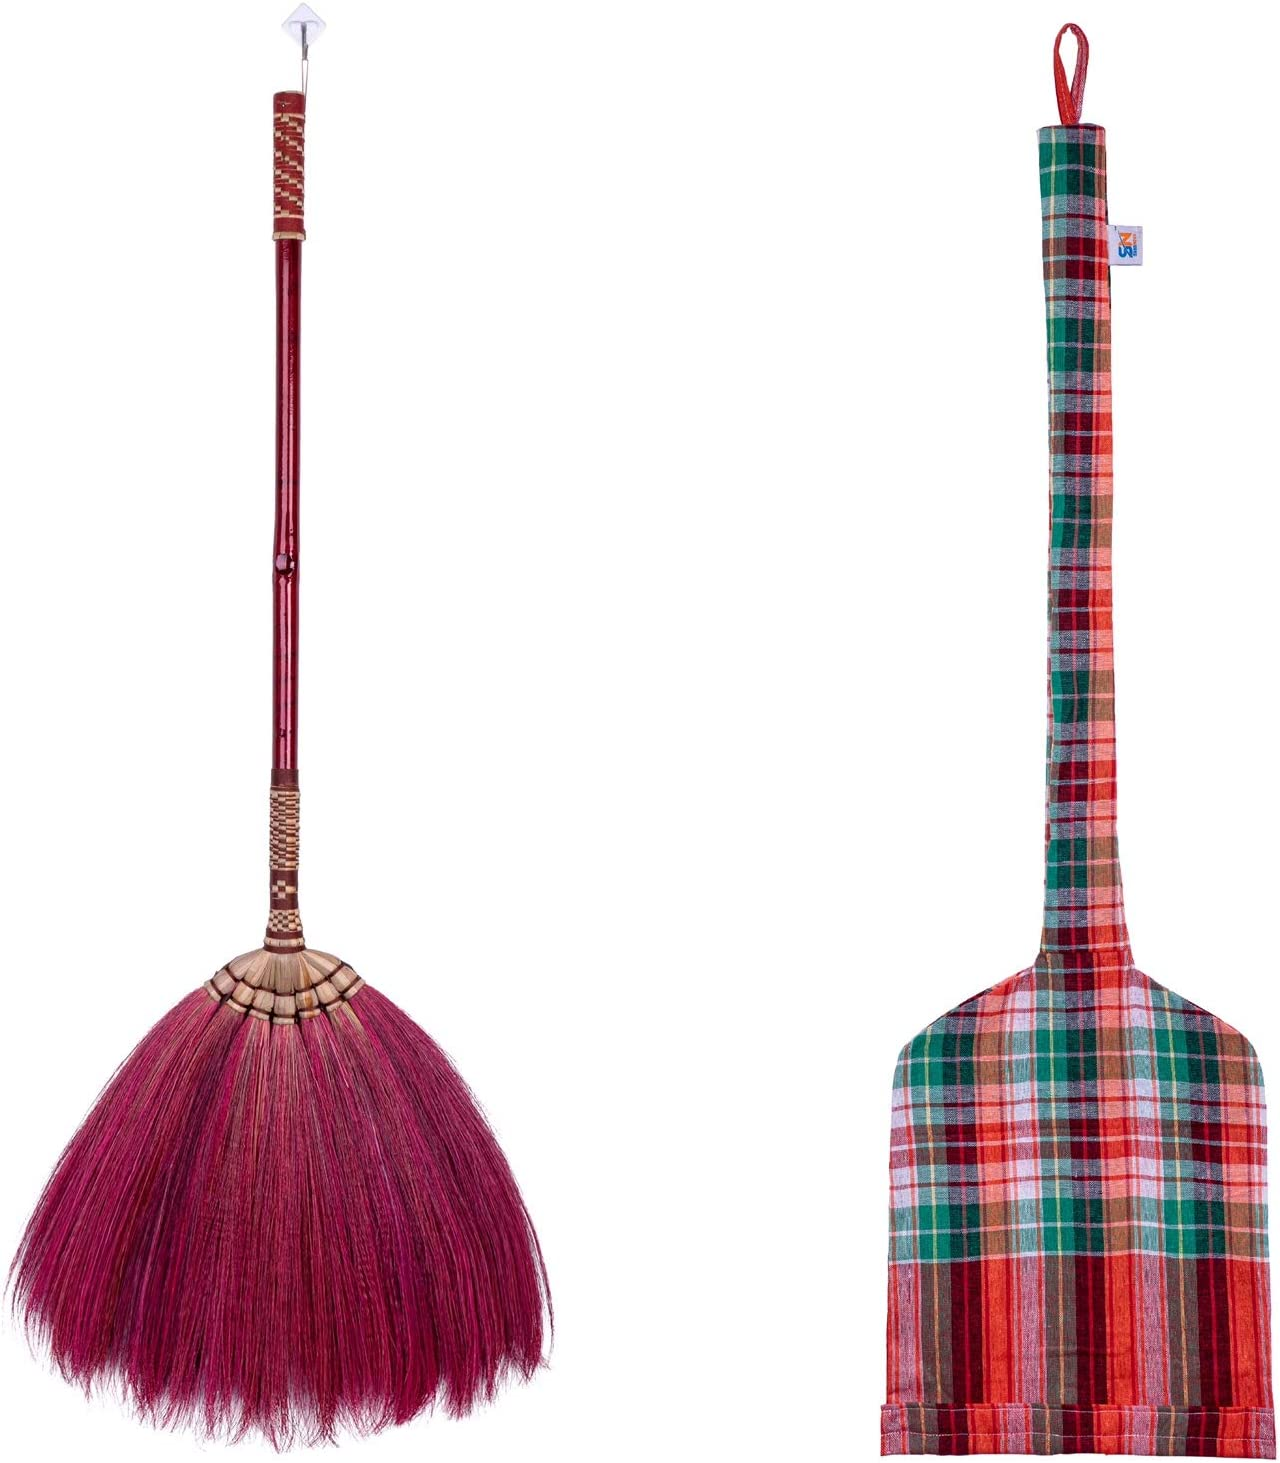 SKENNOVA Max 83% OFF - 1 Piece of 39-41 Asian Broom Natural Max 73% OFF Tall inch Bro